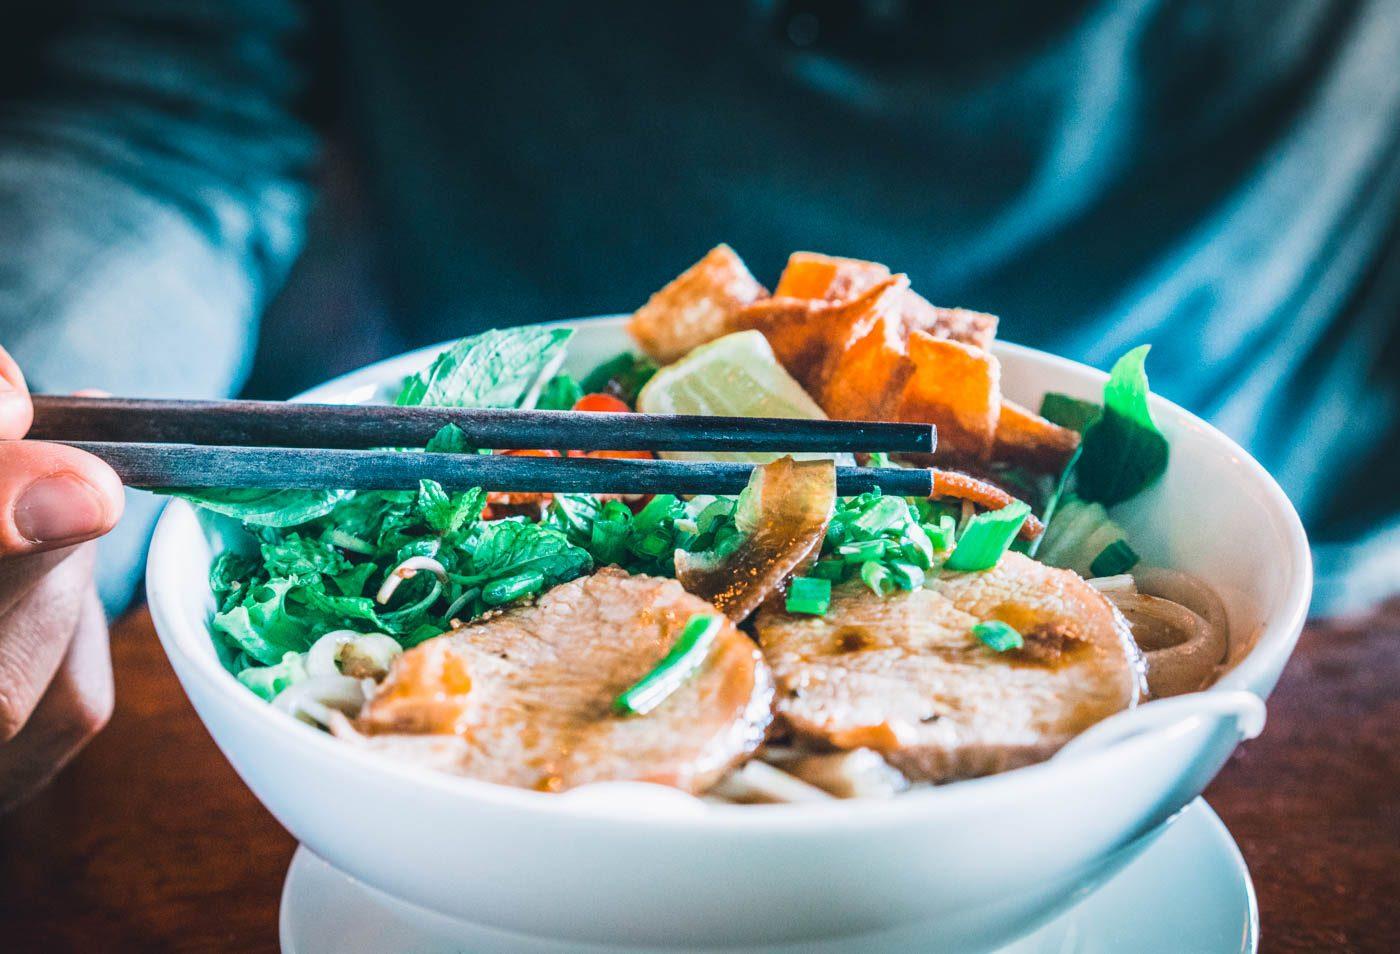 Cao Lau, a unique dish from Central Vietnam region